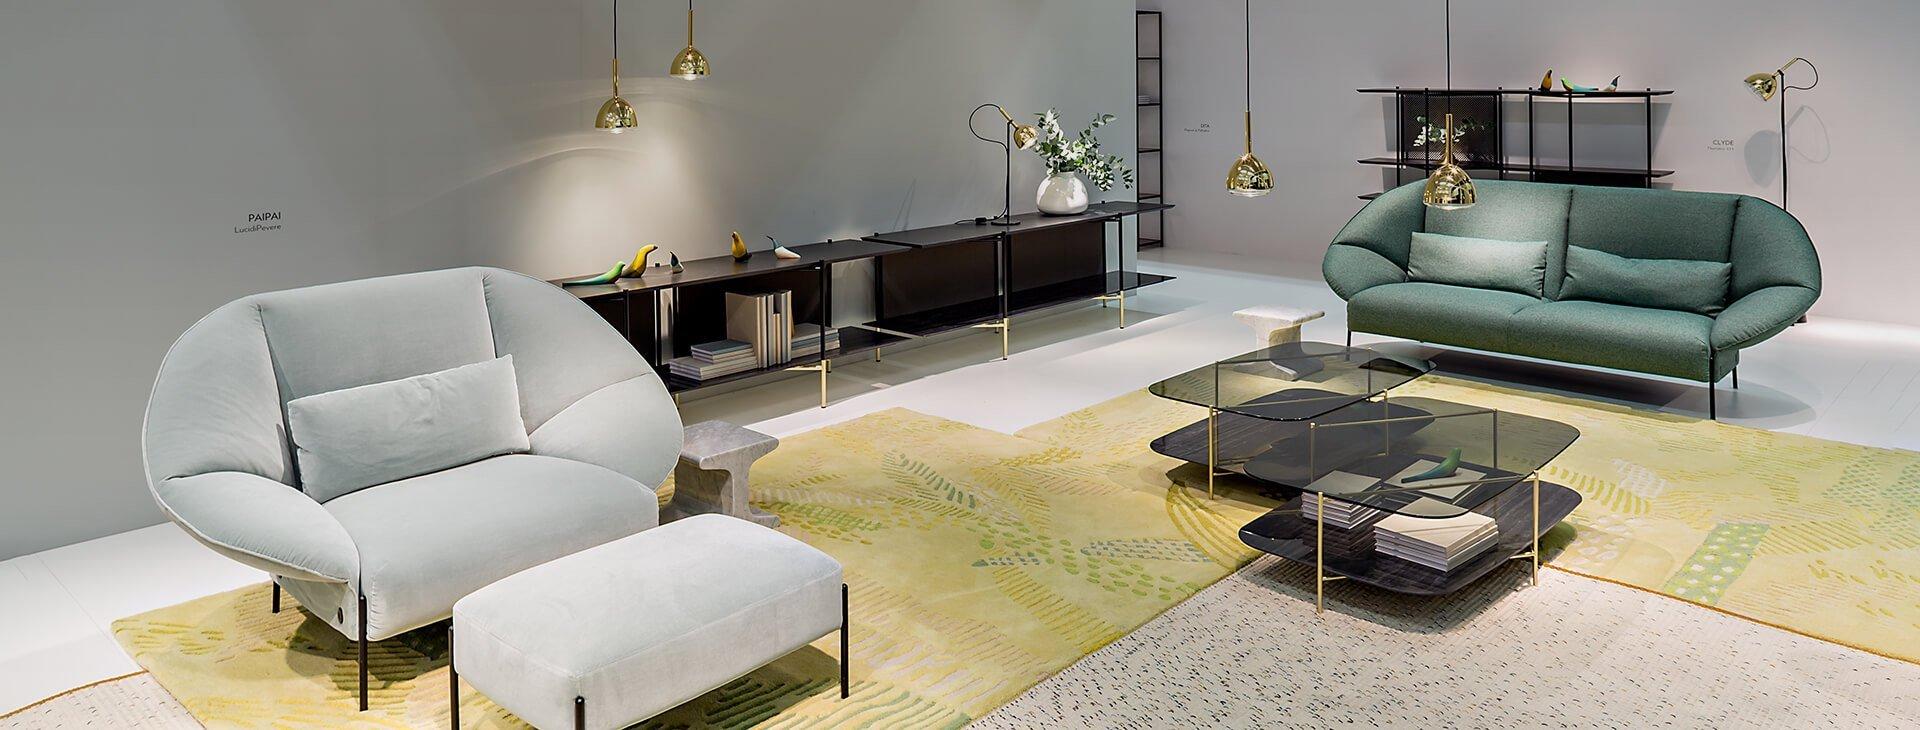 einefragedesdesigns lucidipevere stilwerk news. Black Bedroom Furniture Sets. Home Design Ideas